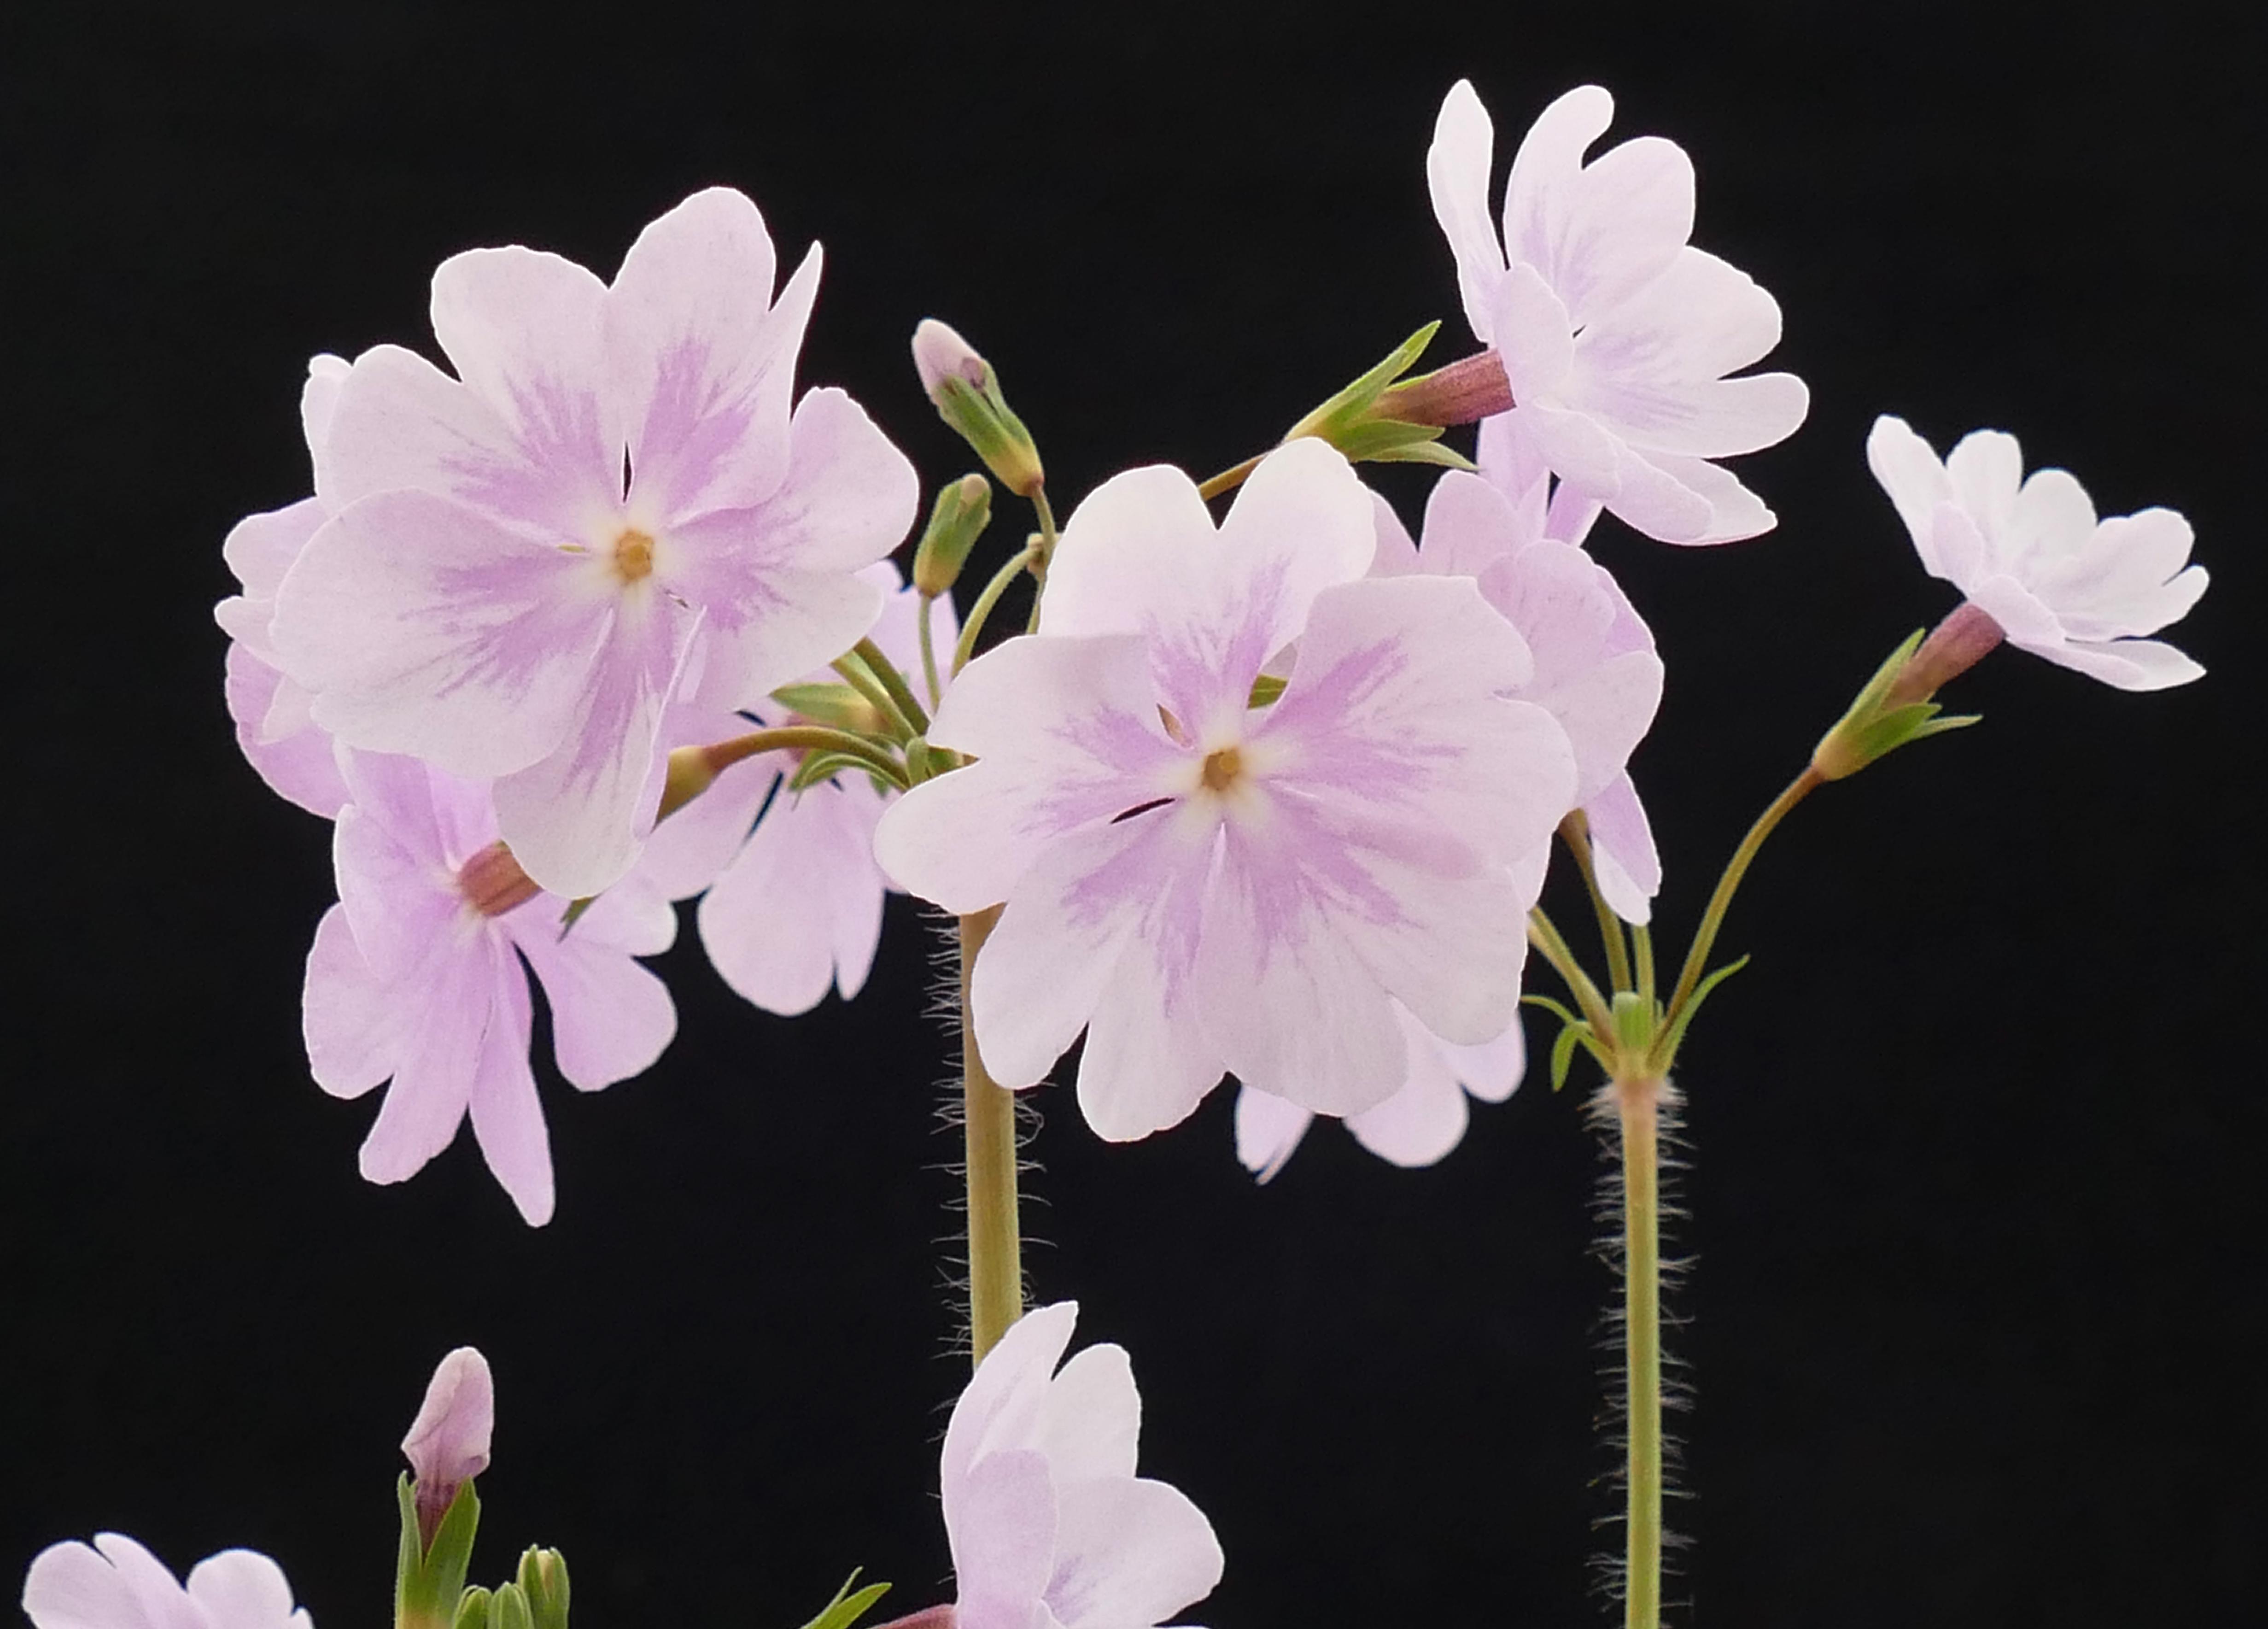 Primula sieboldii 'Hana monyo'_P1750817.